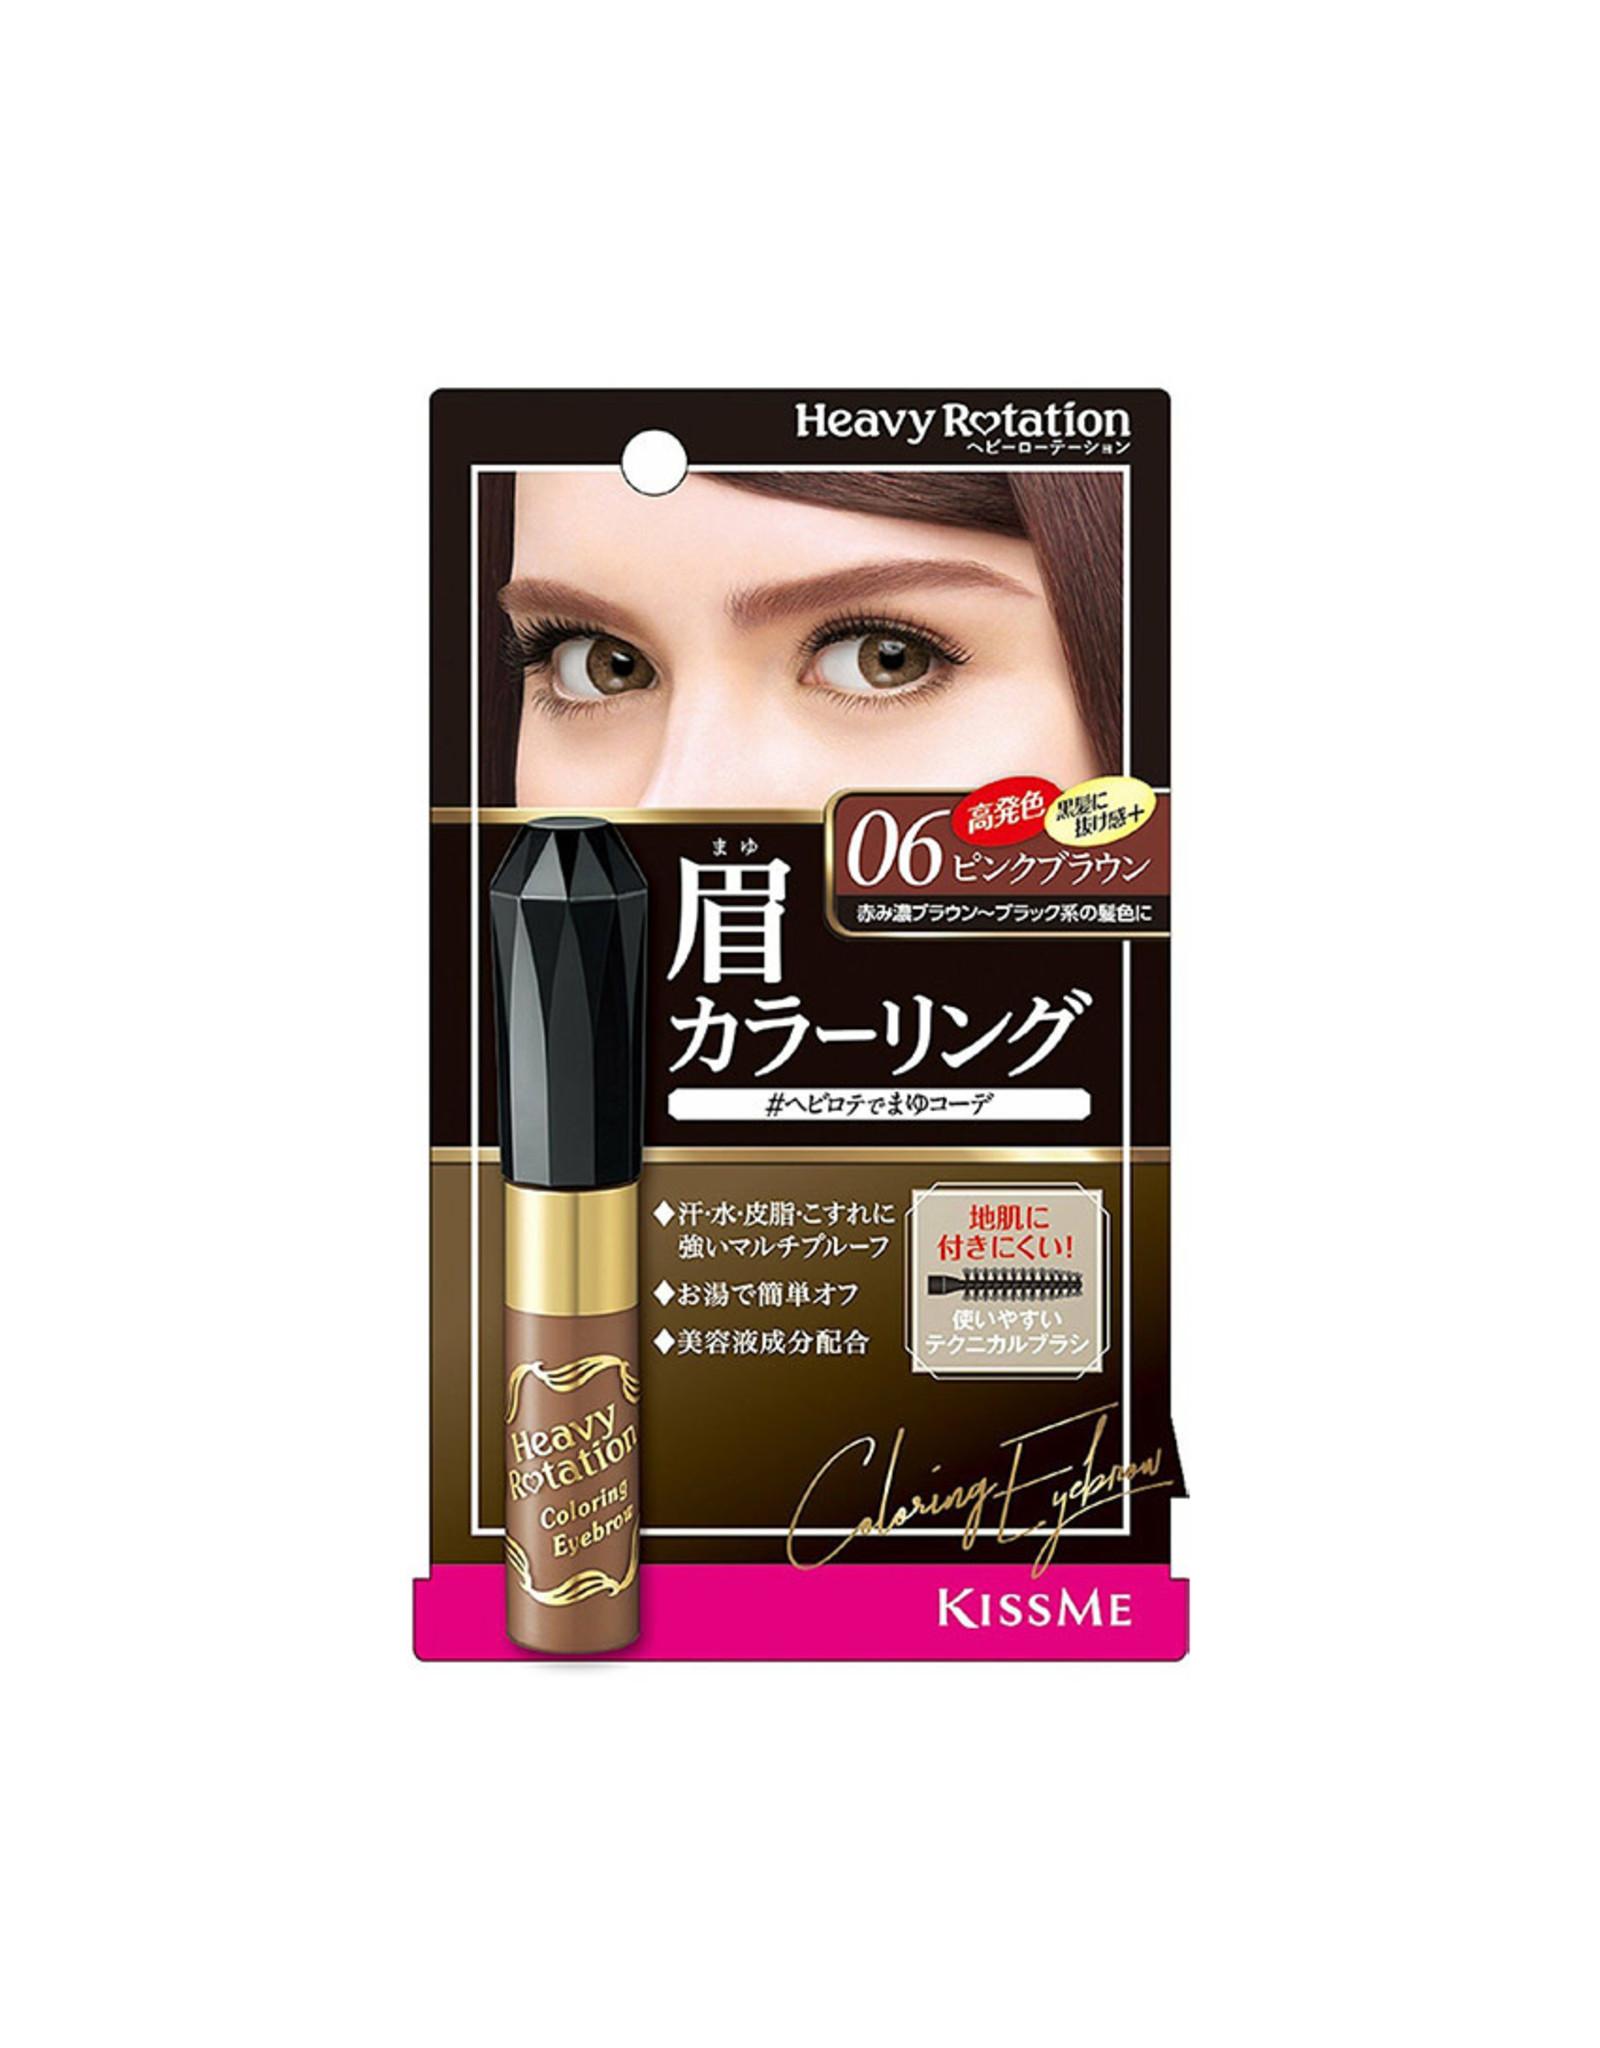 Heroine Kiss Me Heavy Rotation Coloring Eyebrow